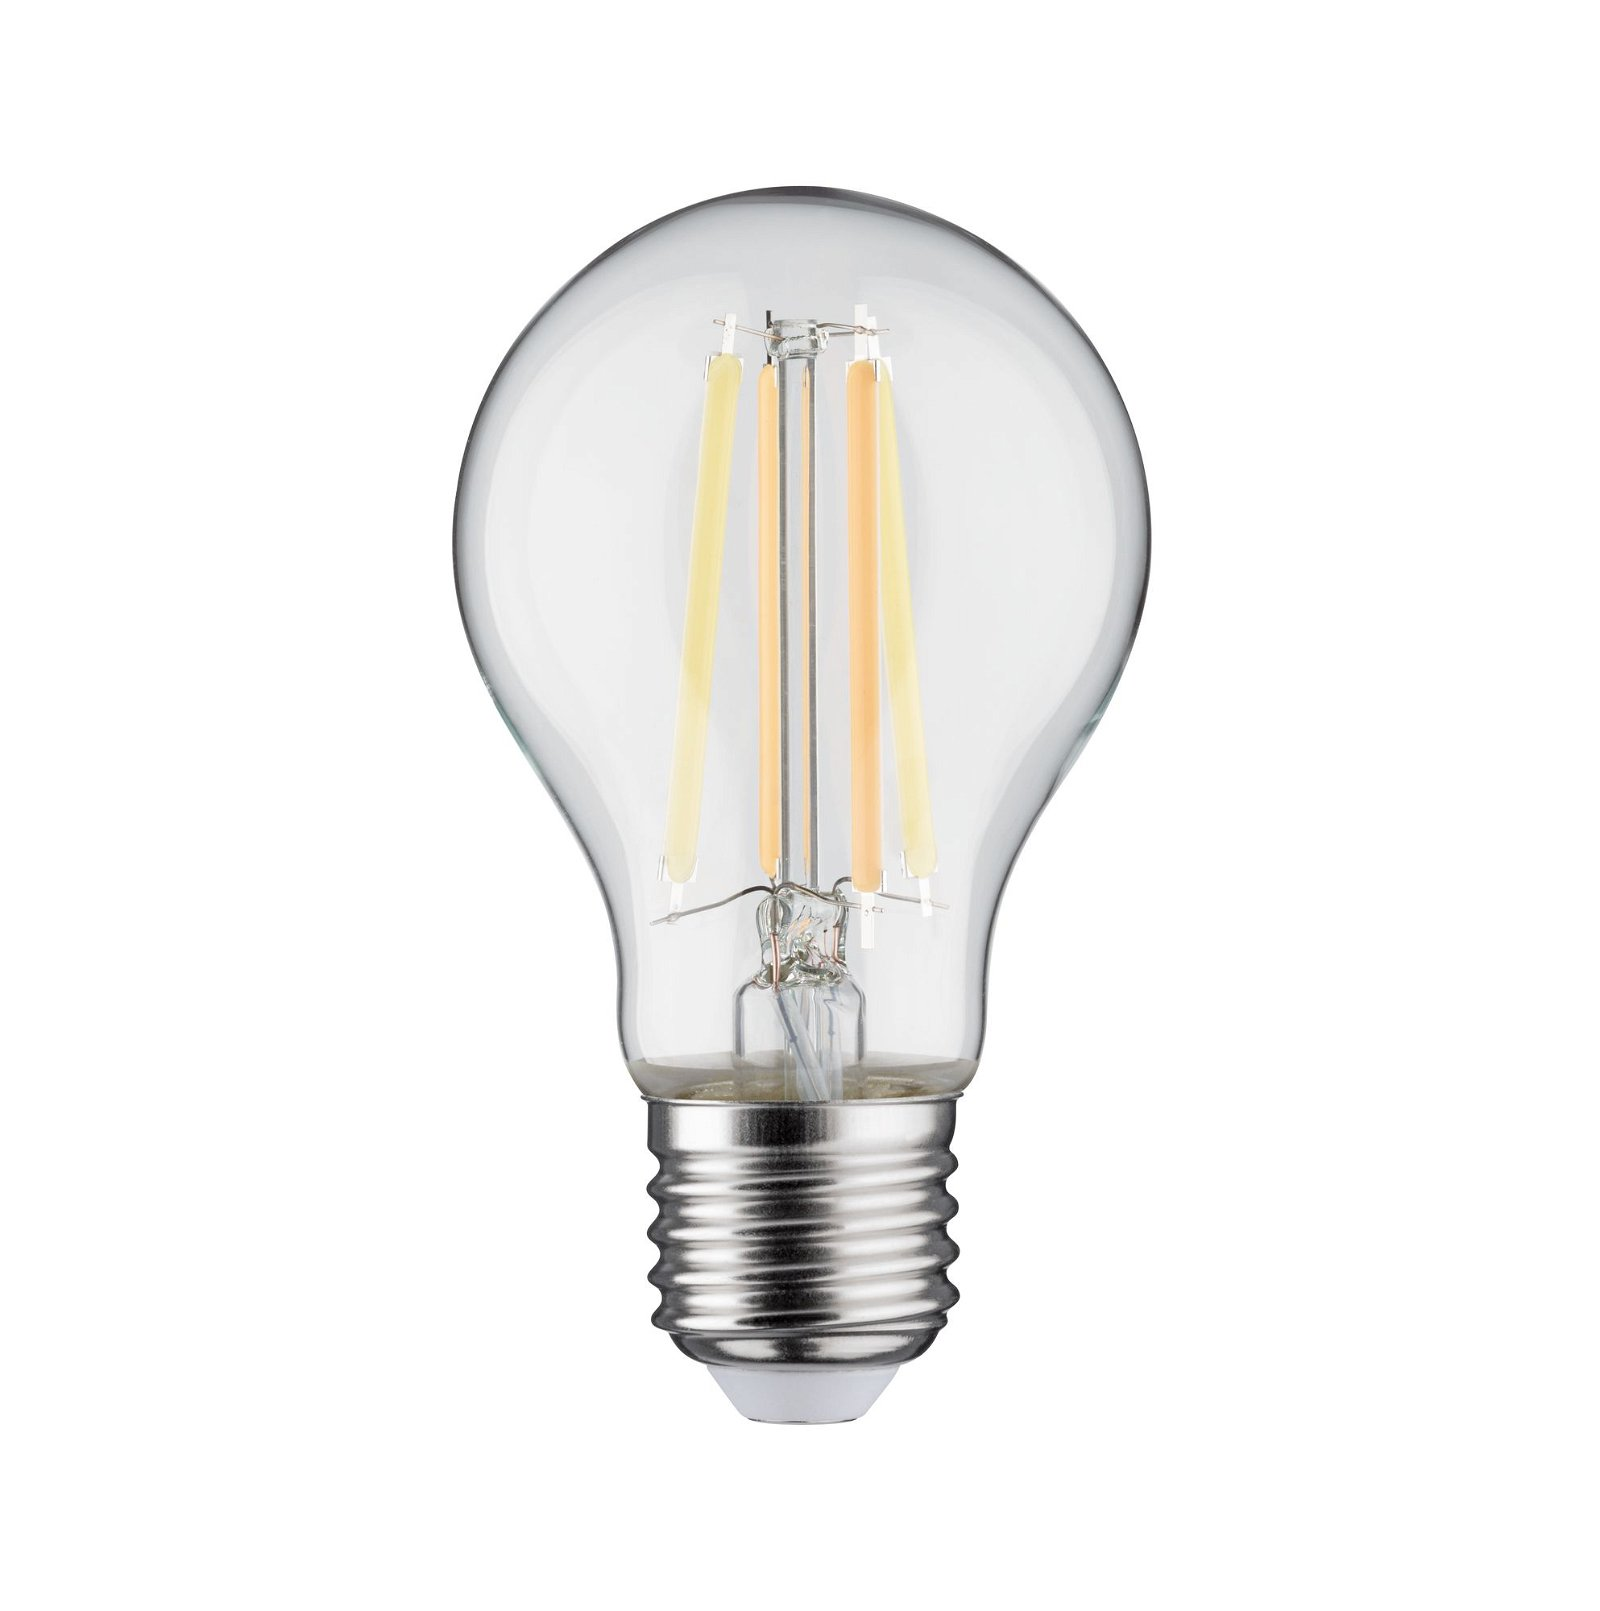 LED Birne Smart Home Zigbee Filament E27 230V 470lm 4,7W Tunable White Klar